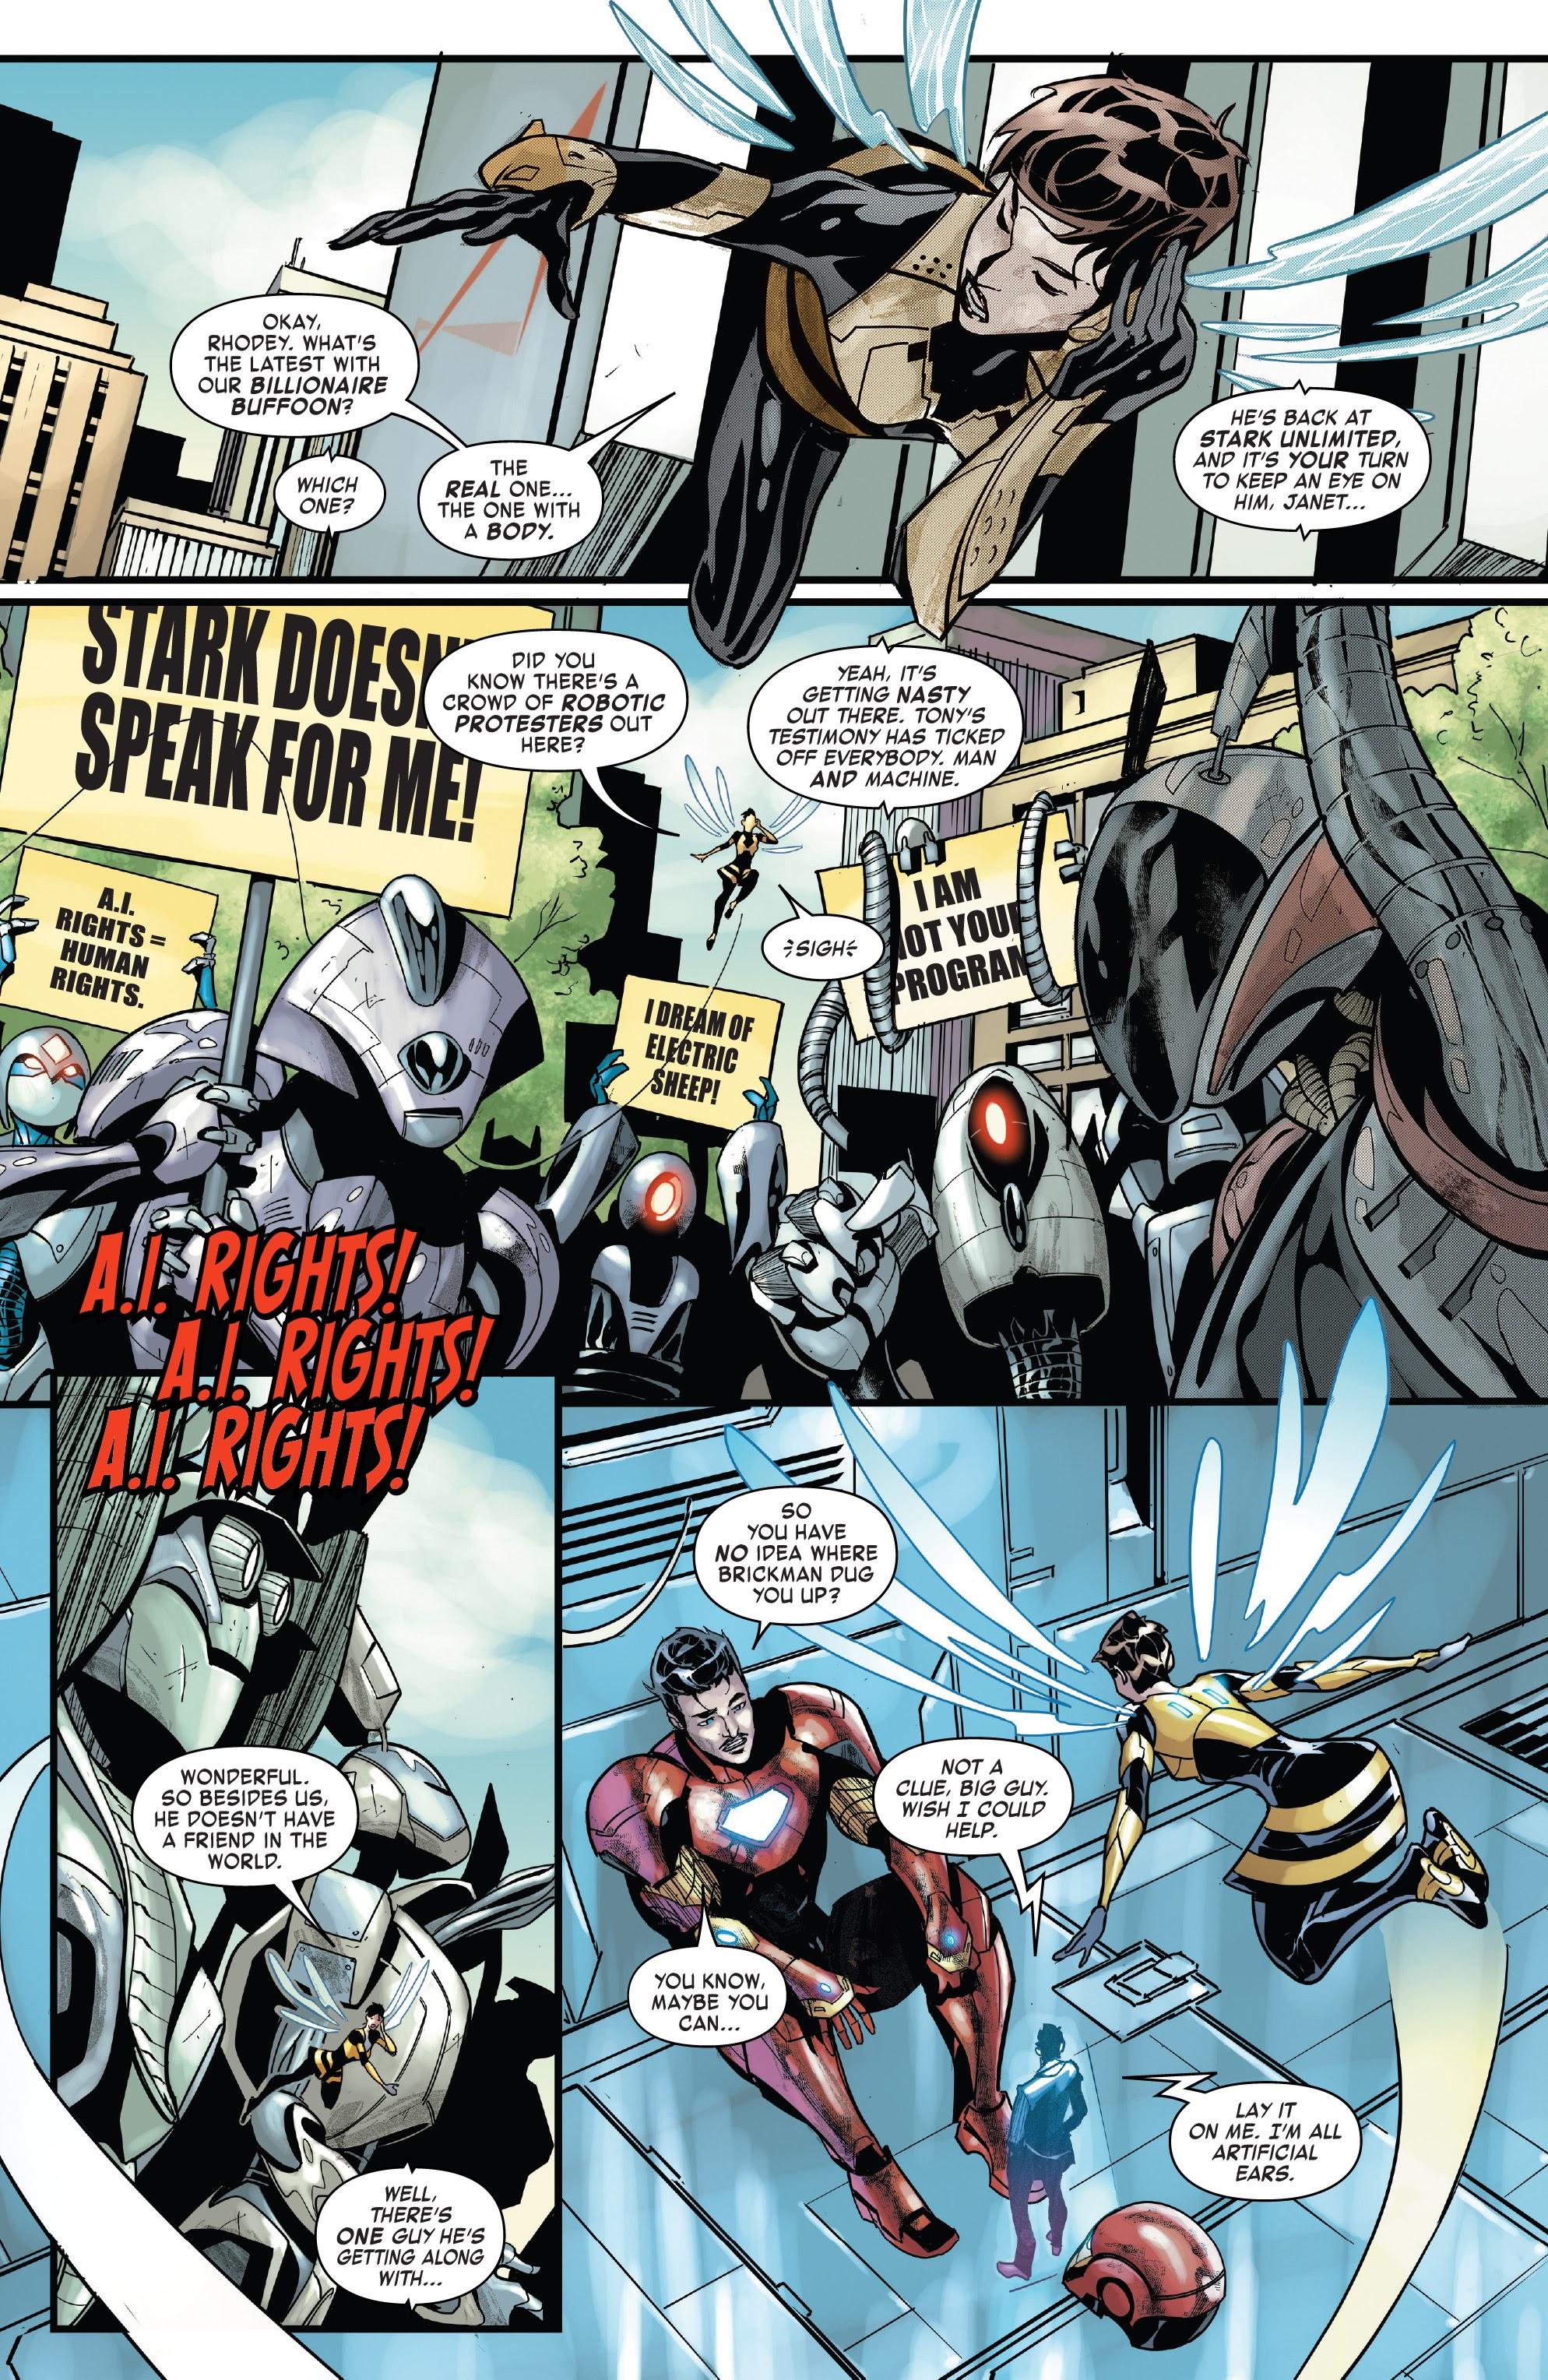 Read online Tony Stark: Iron Man comic -  Issue #15 - 11